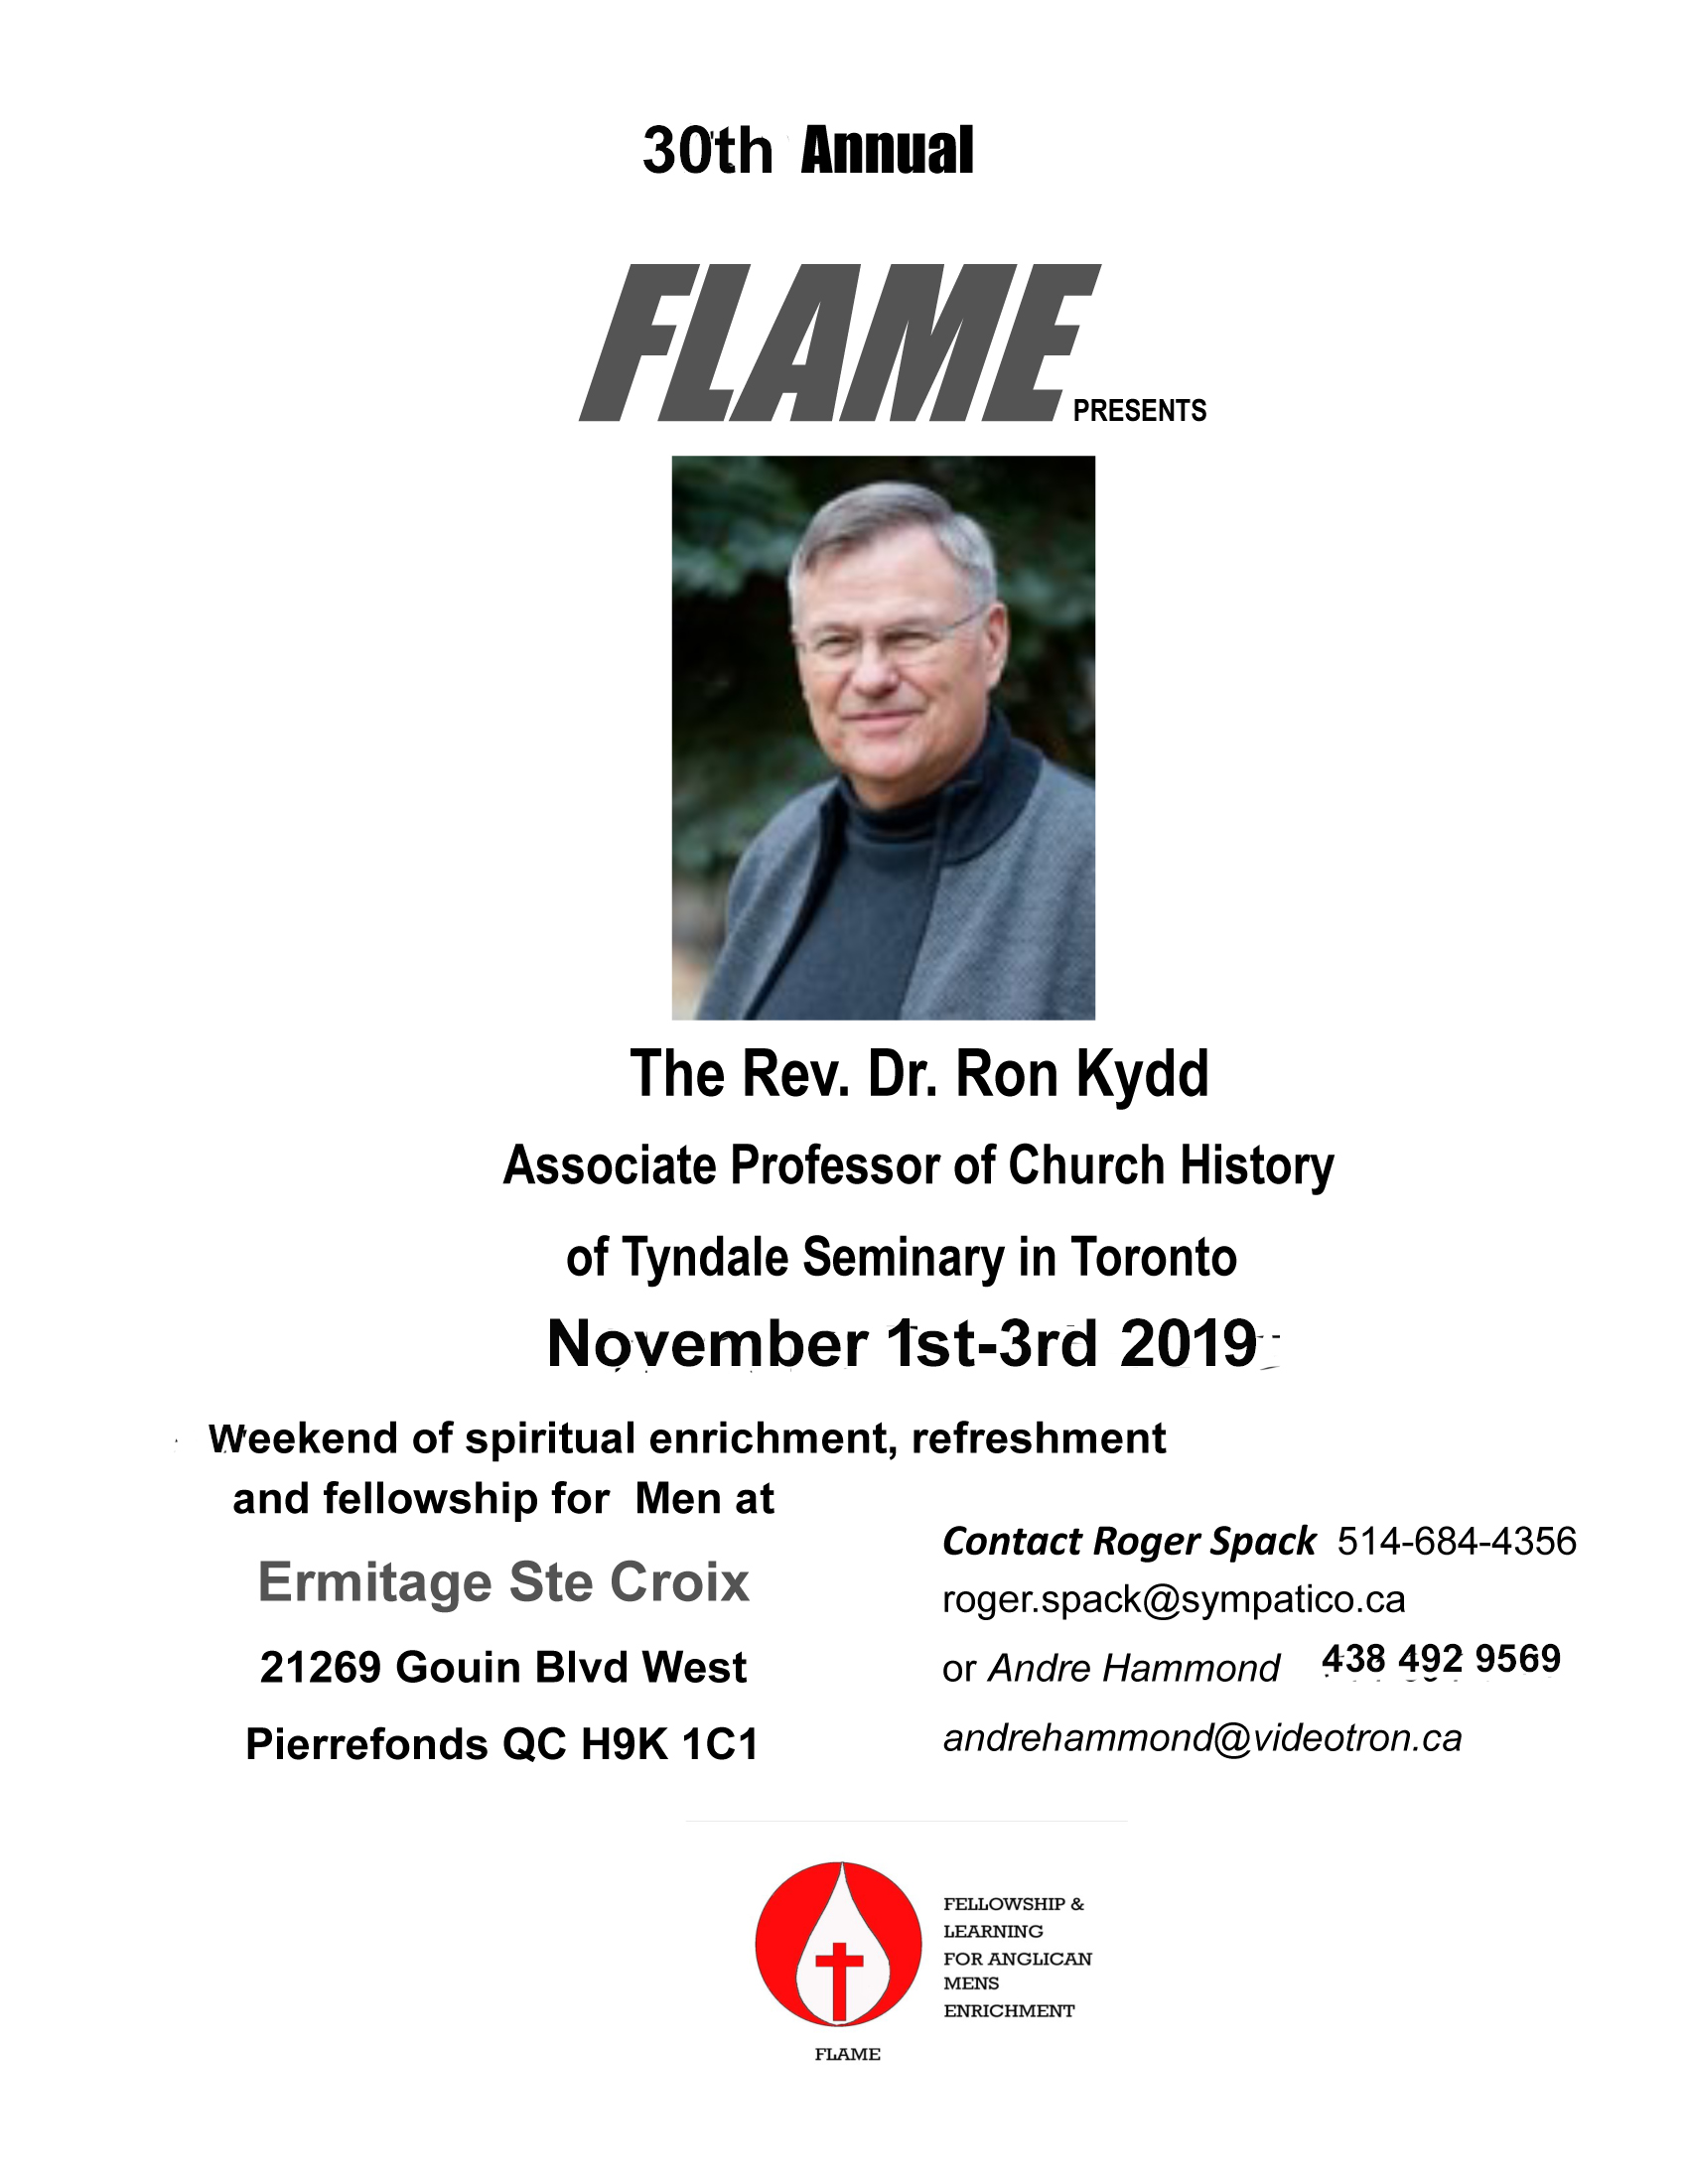 Poster R Kydd copy.jpg